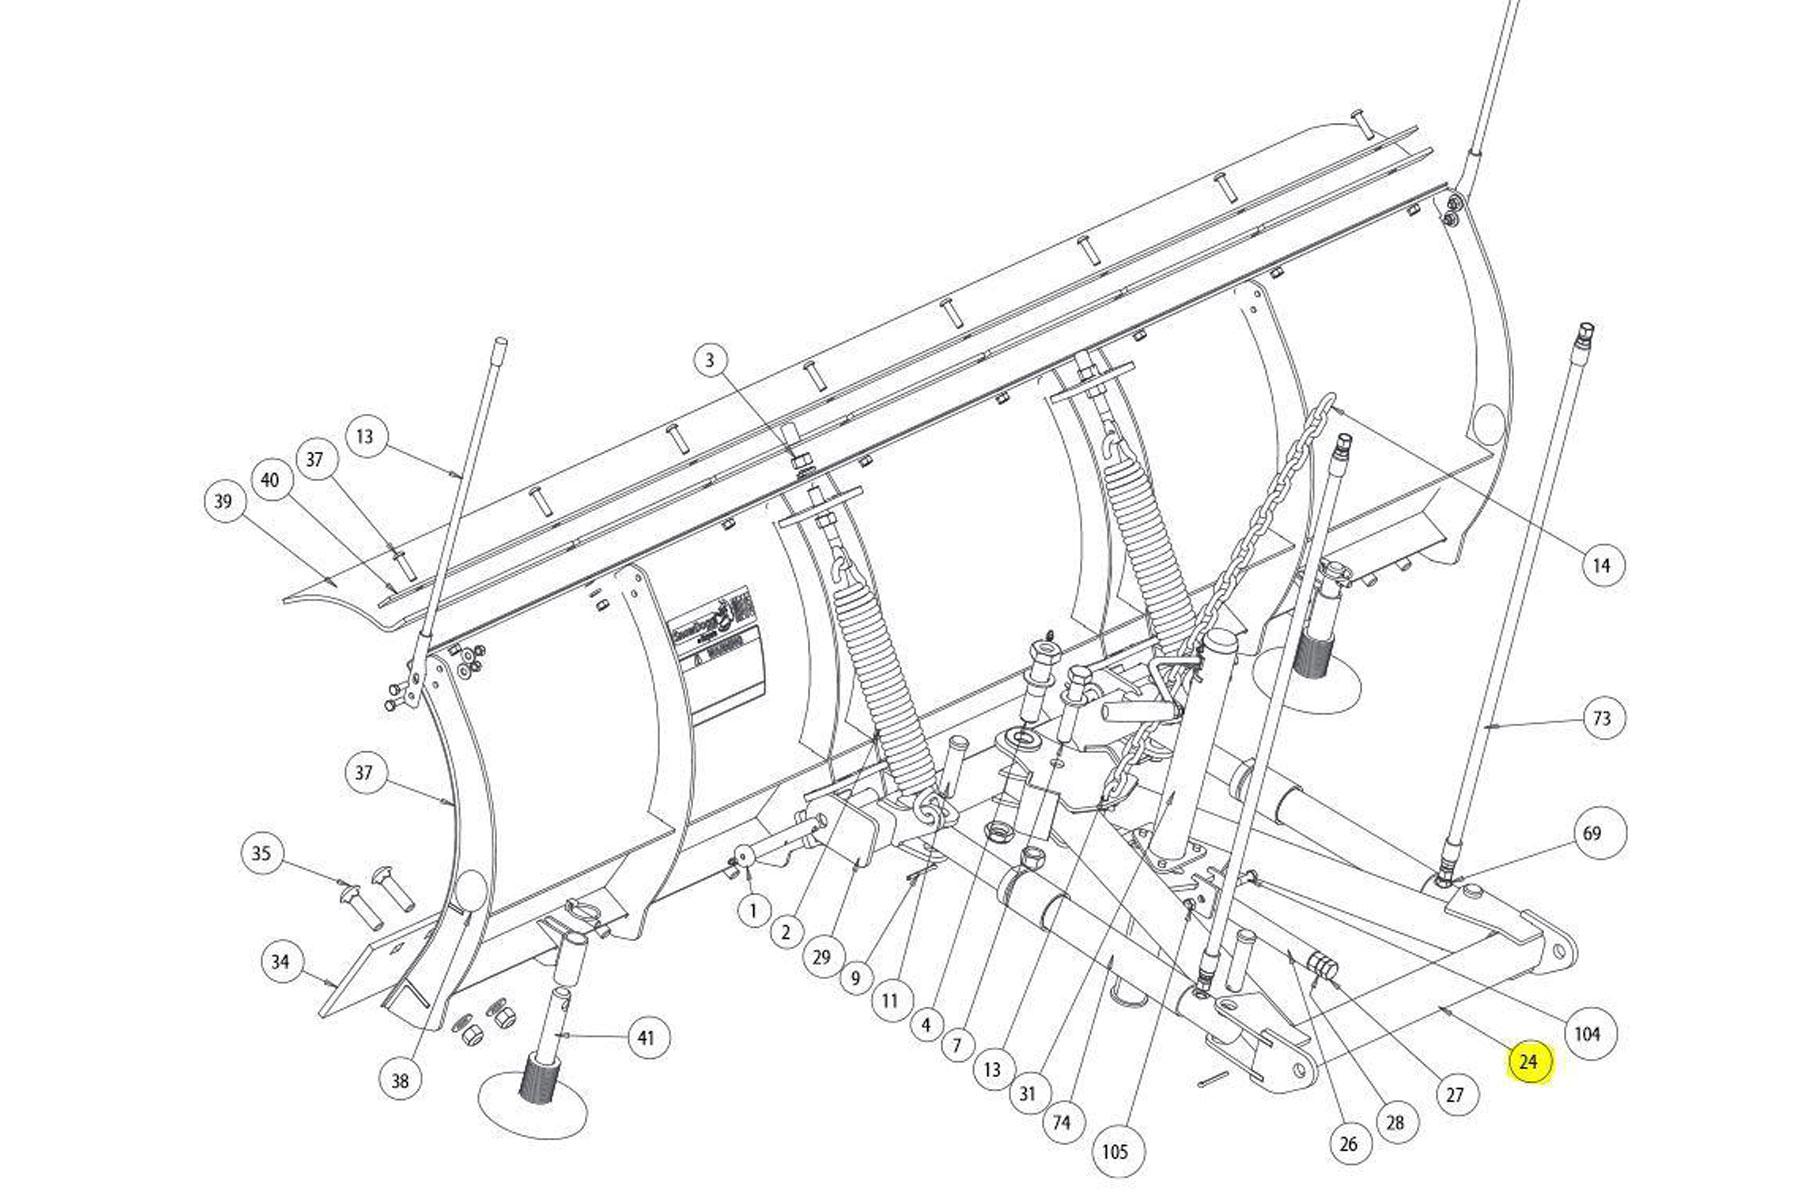 Snow Dogg Wiring Diagram Schematics For 16071150 Snowdogg Harness Sno Way Plow